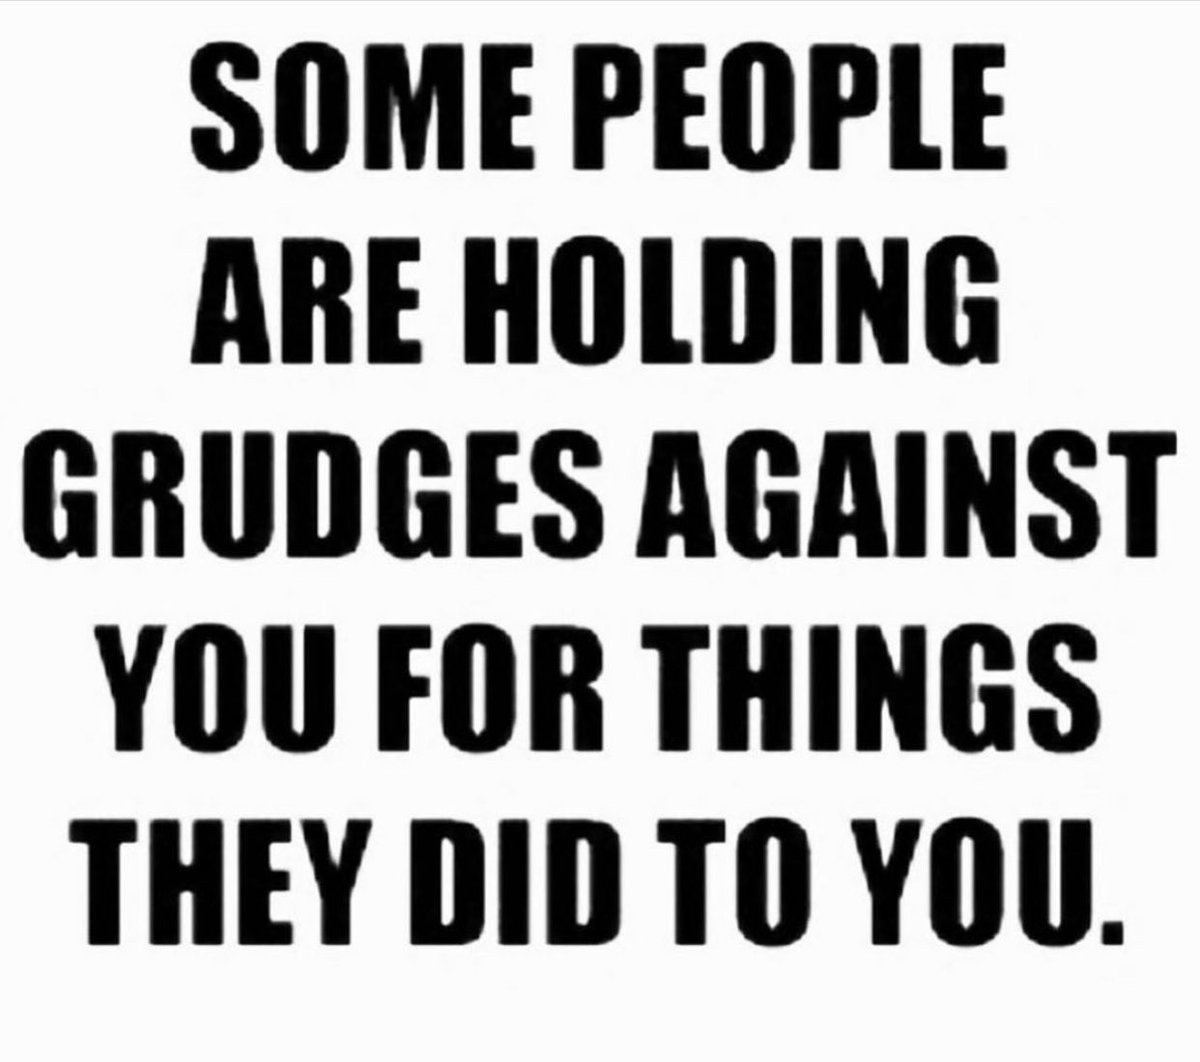 The Audacity. 🤷🏽♂️ #PoPDuKe